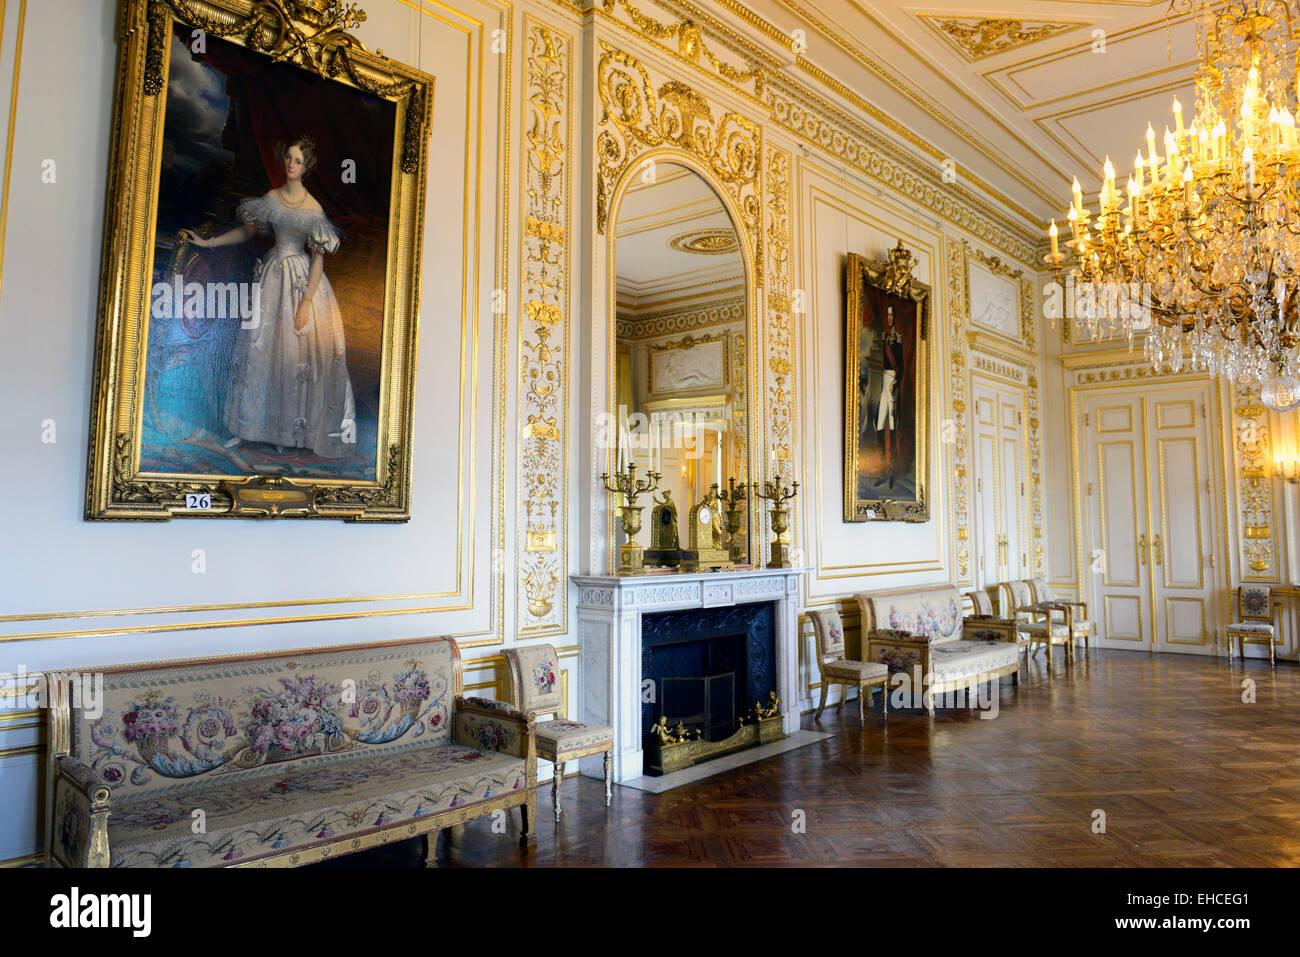 excellent royal palace interior design photos best ideas interior - Royal Palace Interior Design